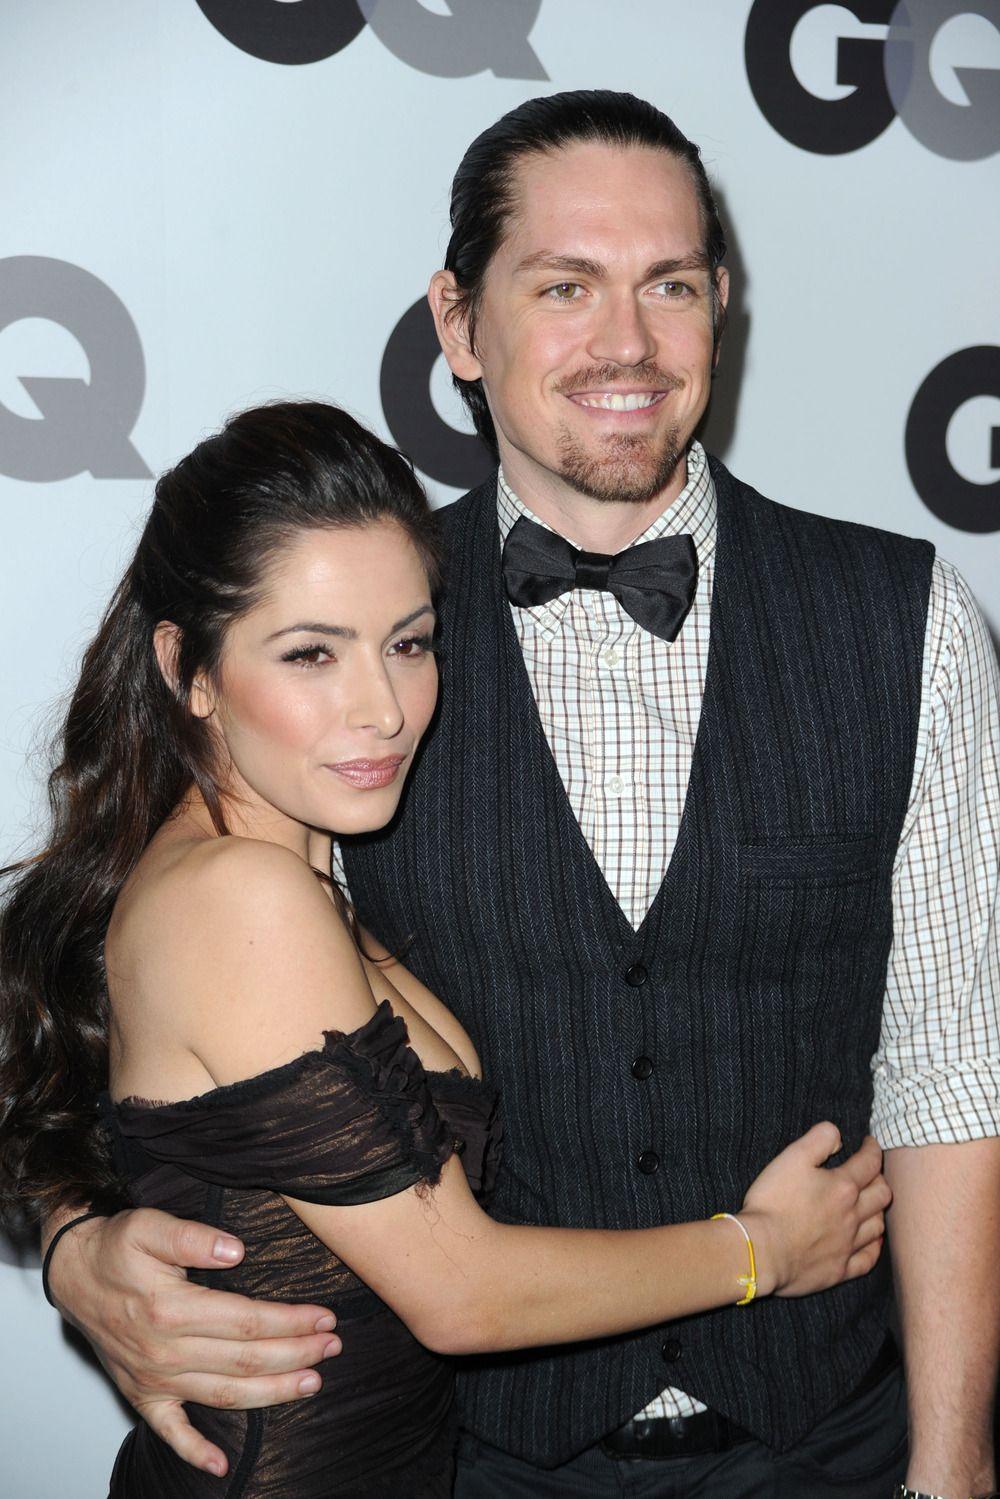 Shameless S Steve Howey And Wife Sarah Shahi Are Expecting Twins Sarah Shahi Steve Howey Expecting Twins